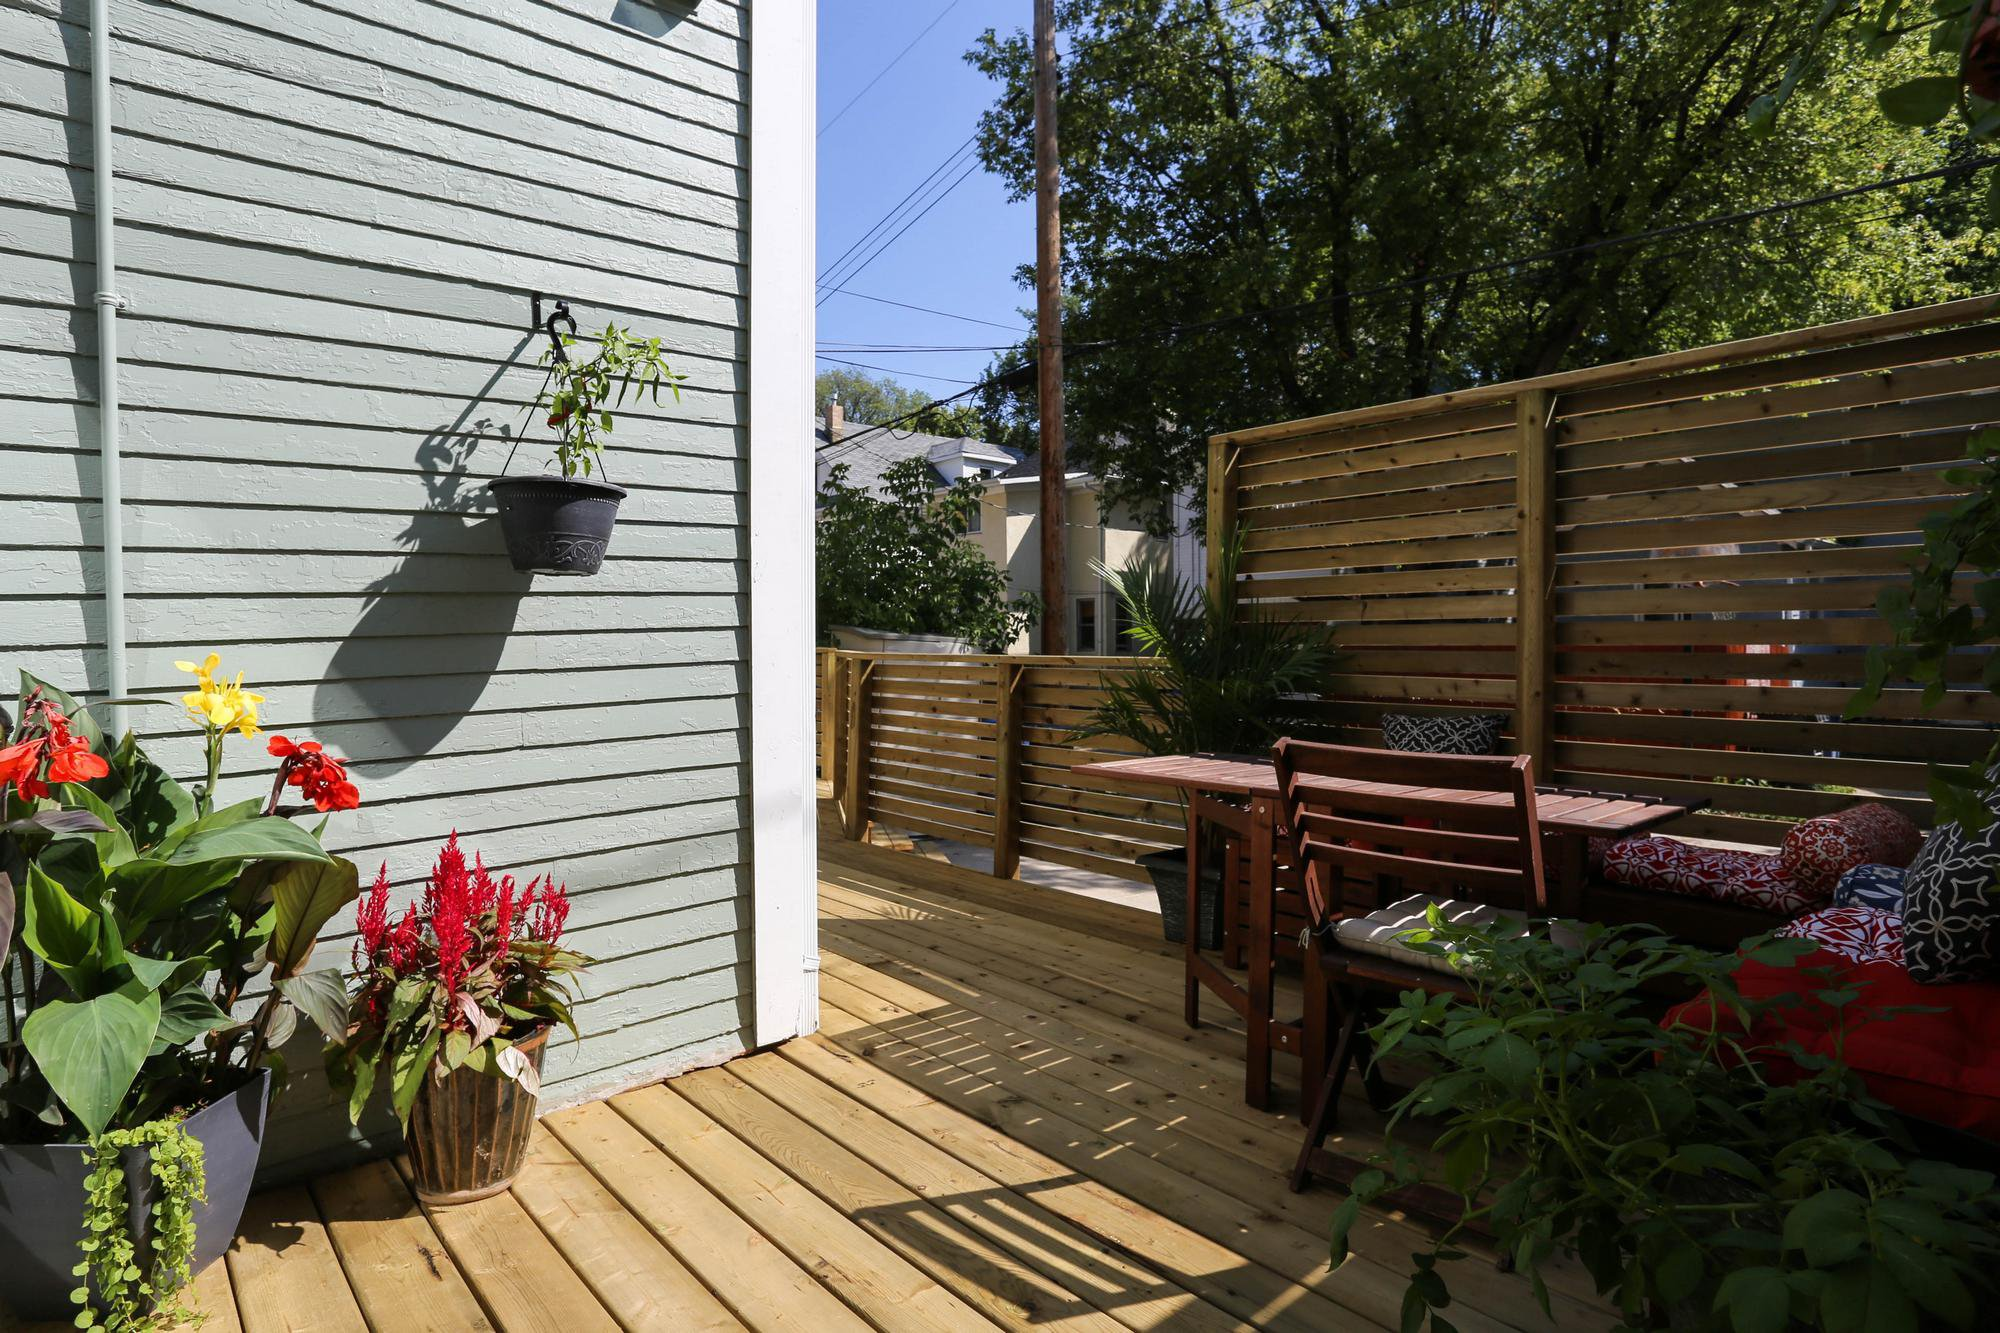 Photo 33: Photos: 105 Evanson Street in Winnipeg: Wolseley Single Family Detached for sale (5B)  : MLS®# 1821900